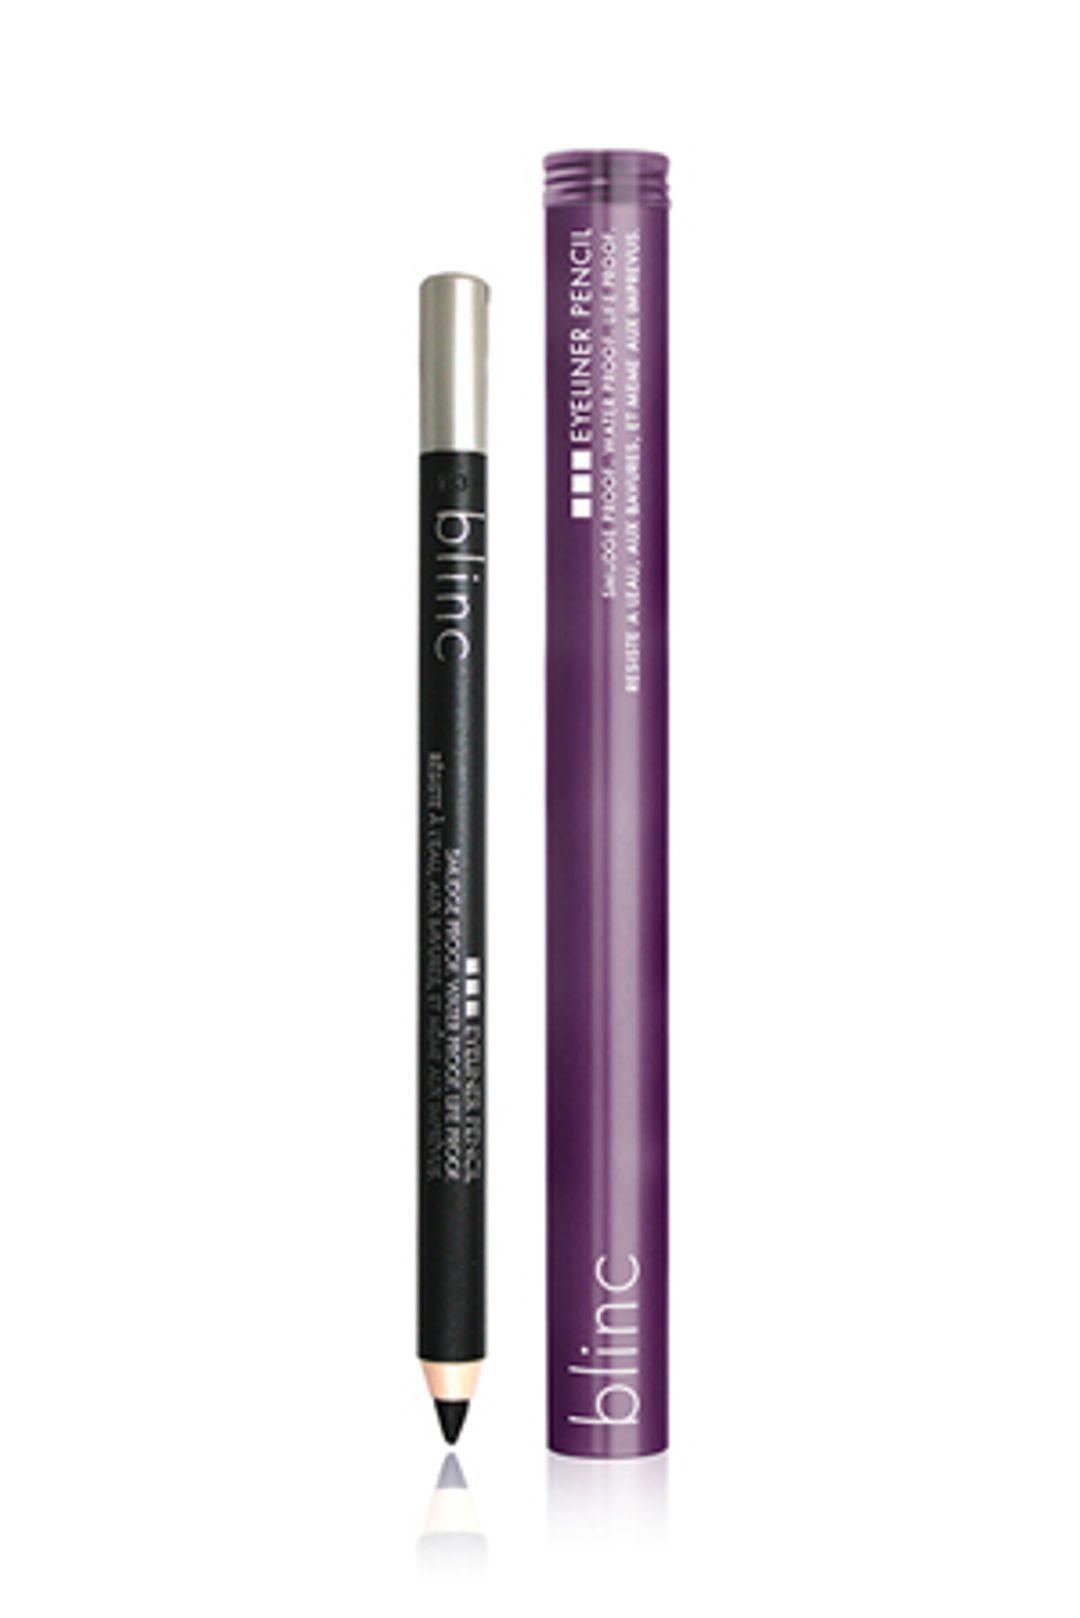 Blinc - Eyeliner Pencil - Black